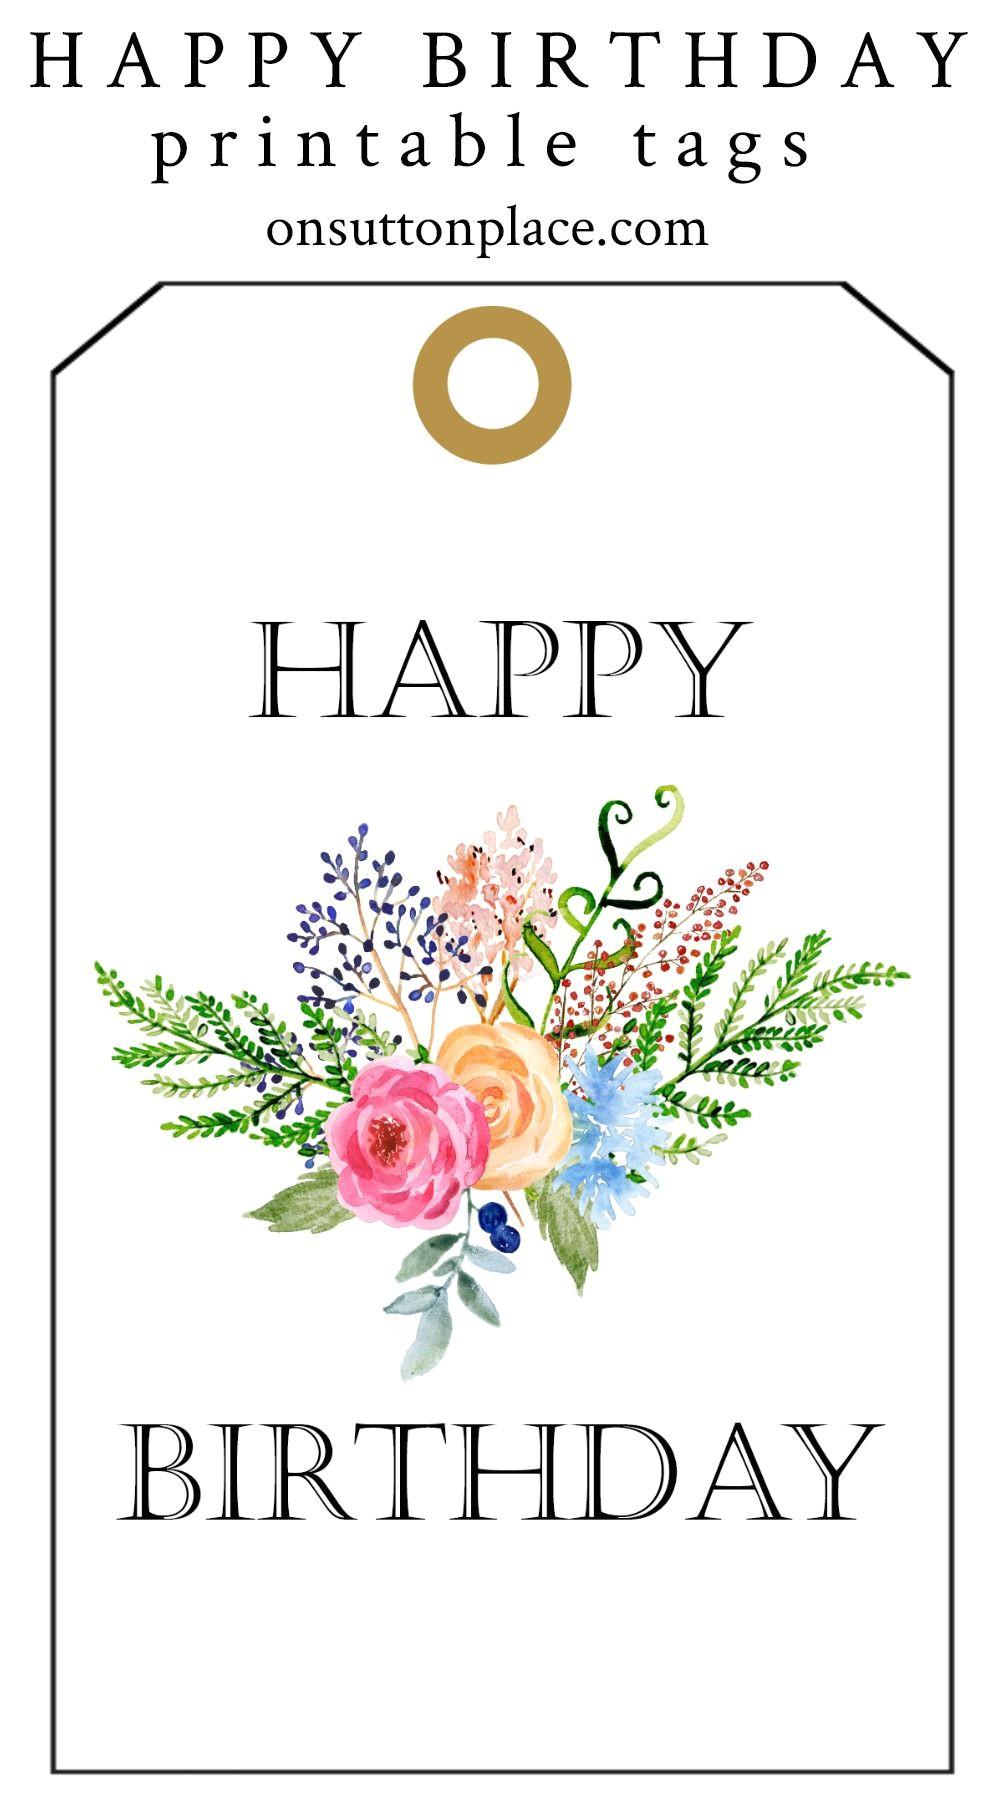 Happy Birthday Free Printable Card Happy Birthday Free Printable Gift Tags Birthday Gift Tags